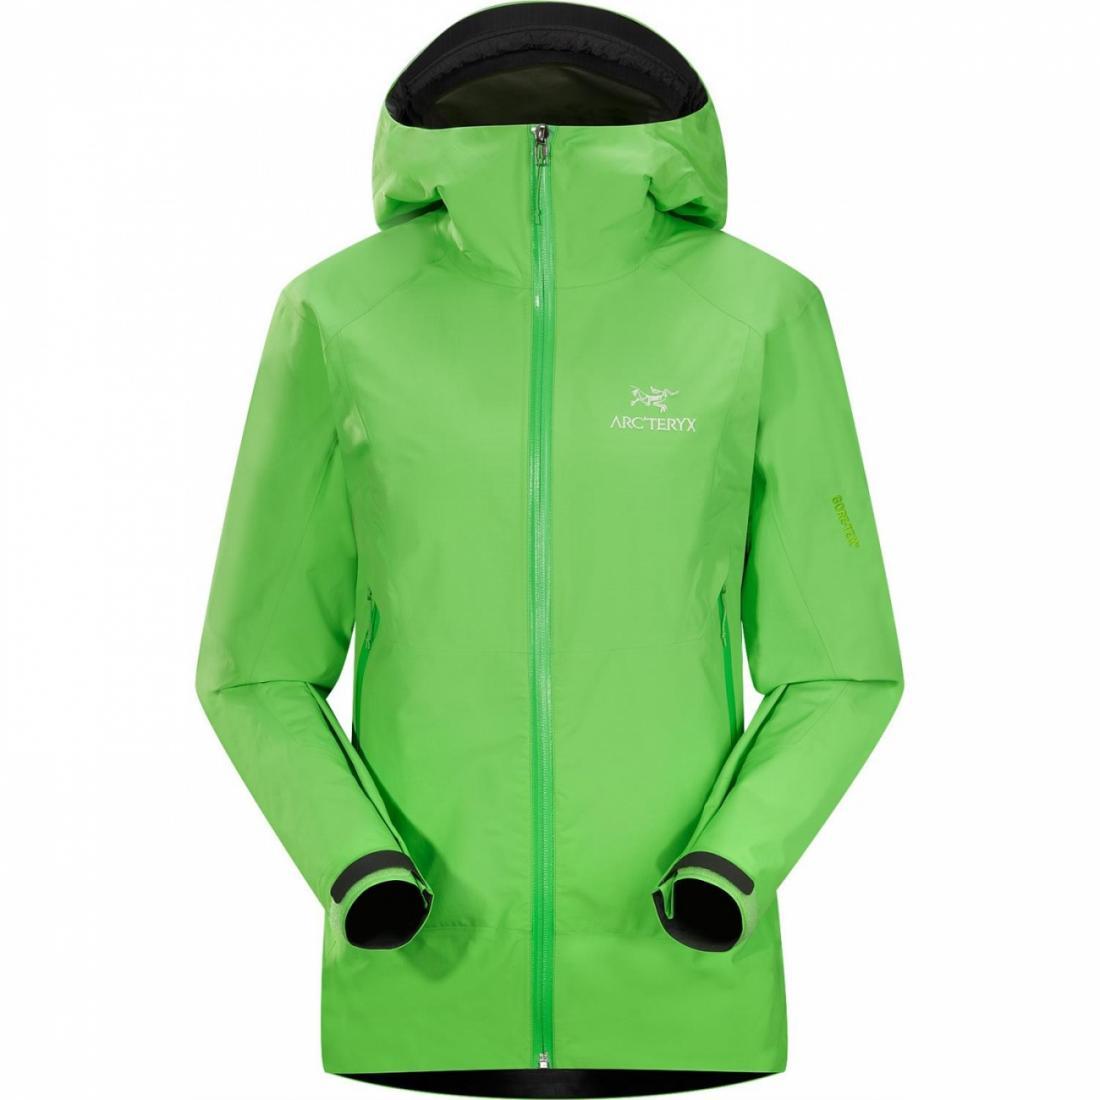 Куртка Beta SL жен.. Производитель: Arcteryx, артикул: 102611